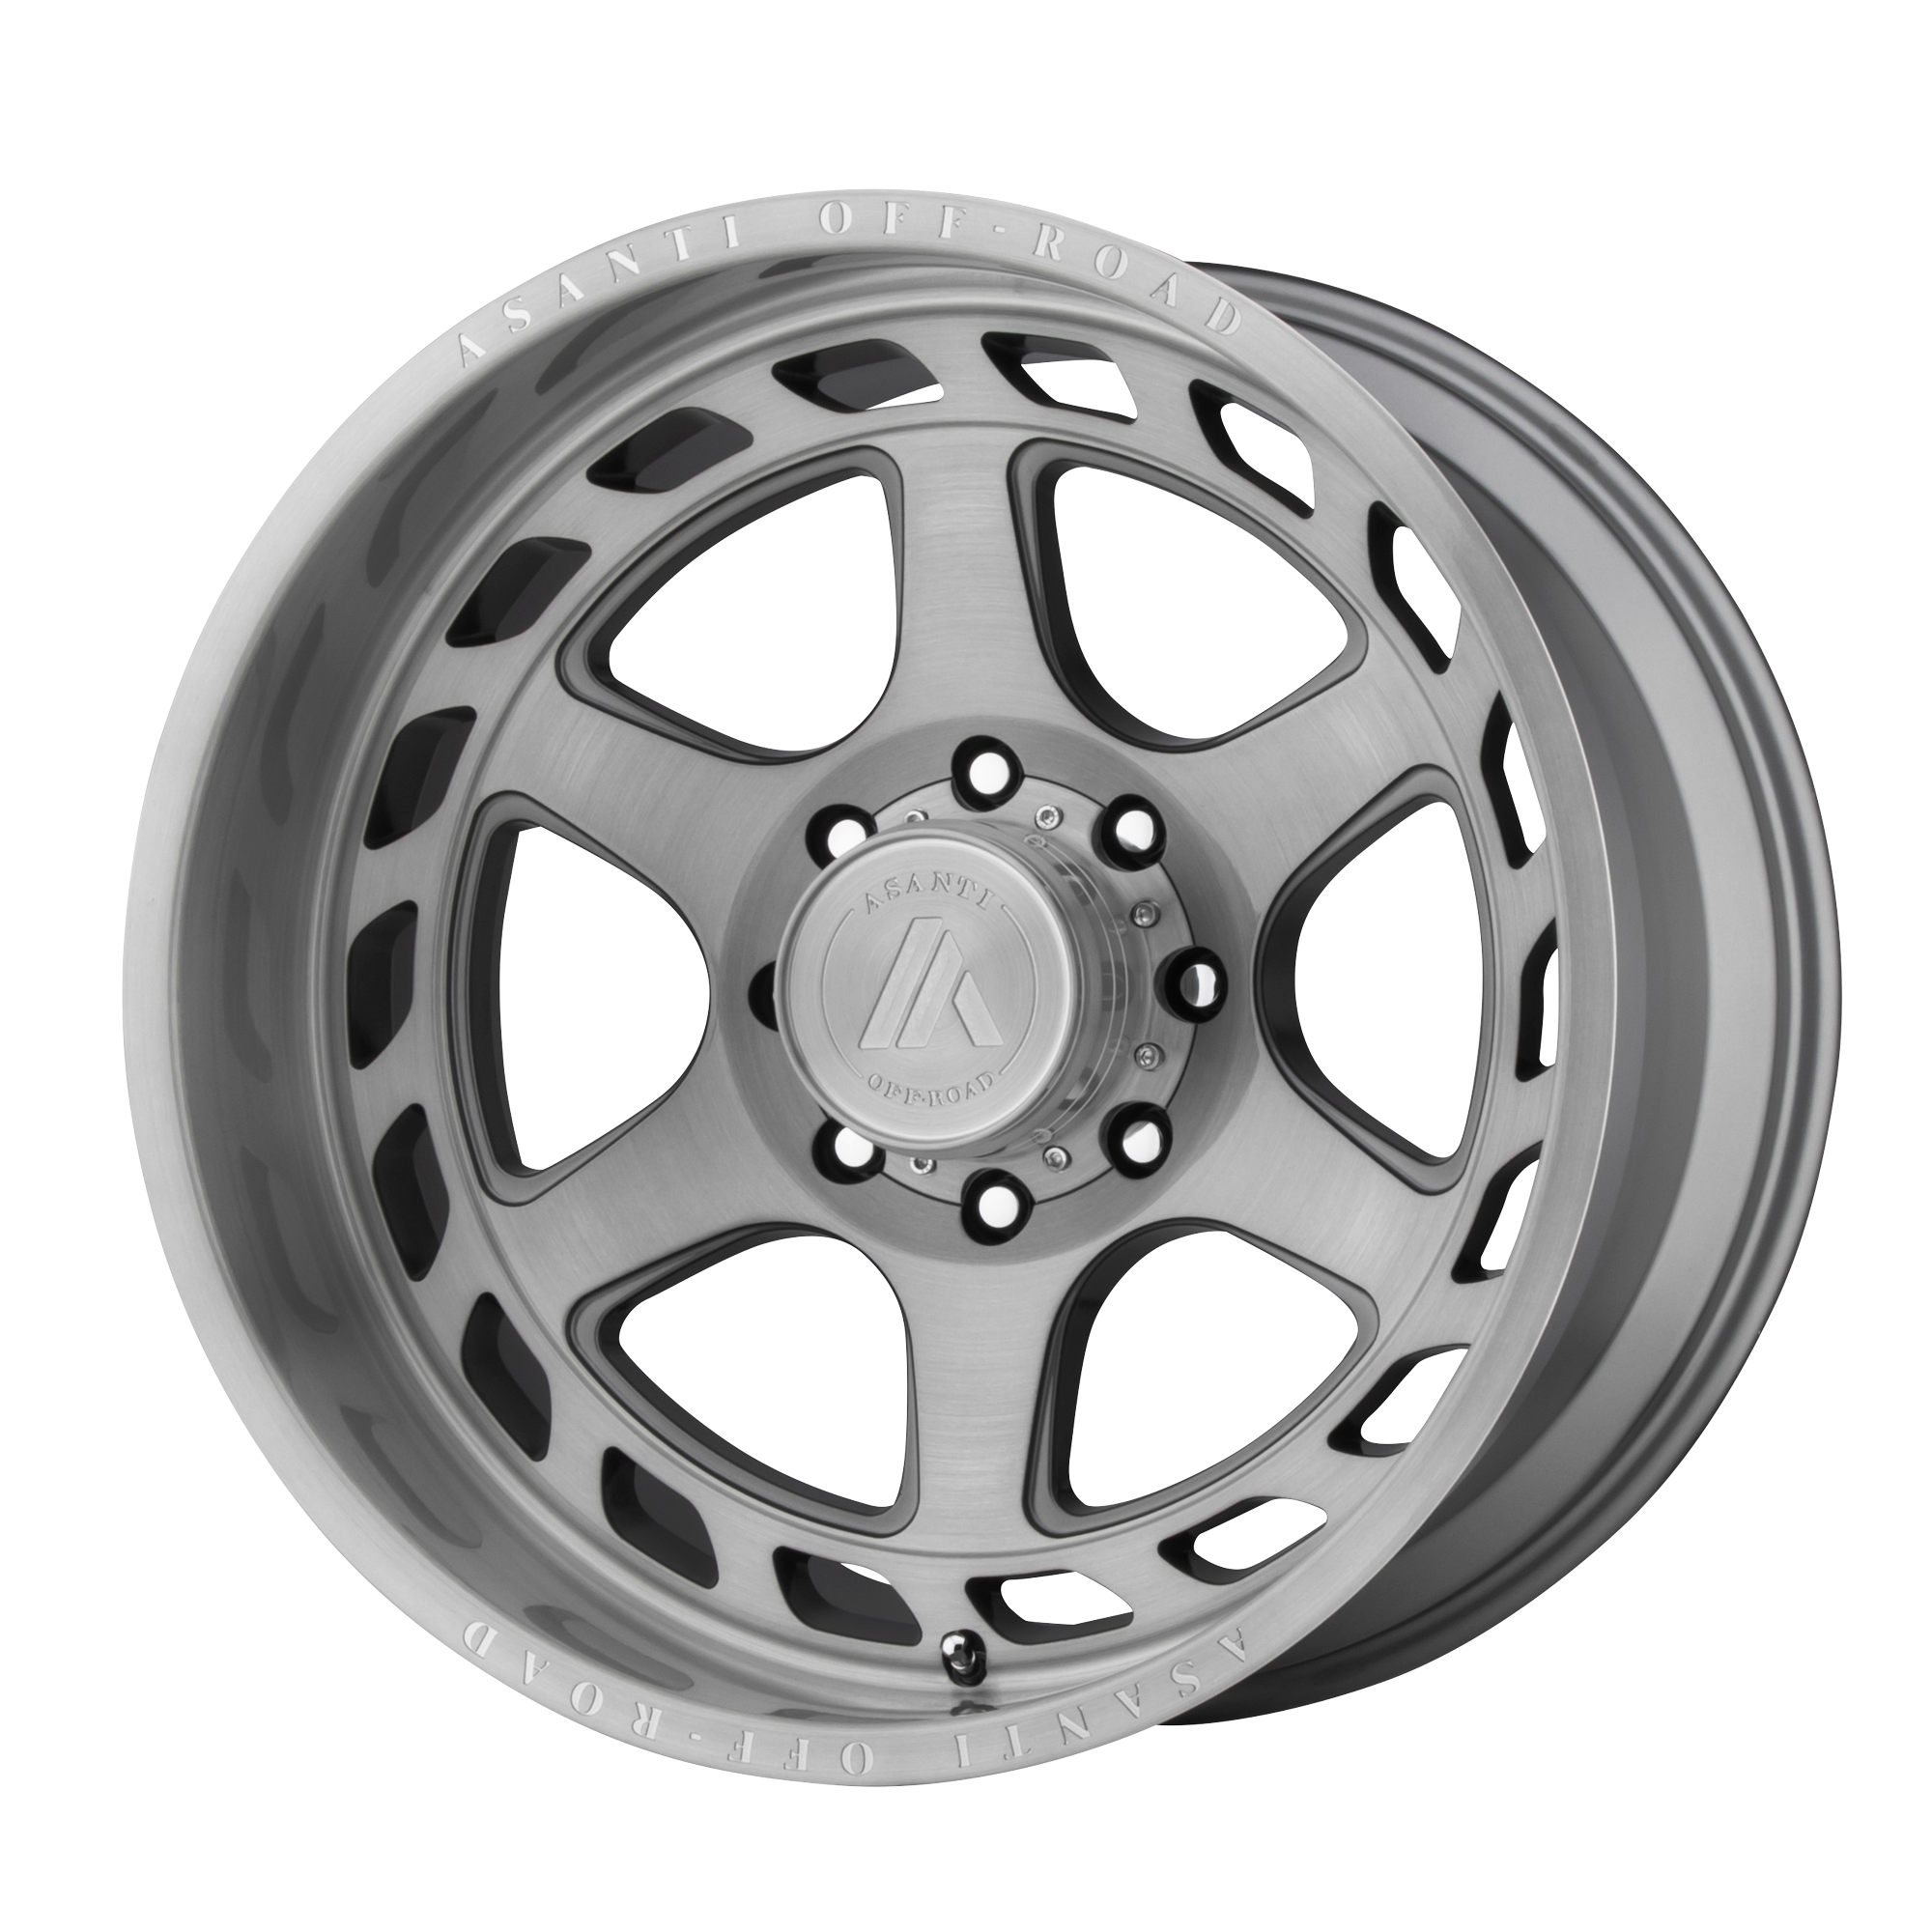 ASANTI OFF ROAD AB816 ANVIL hliníkové disky 9x20 5x127 ET18 Titanium-Brushed